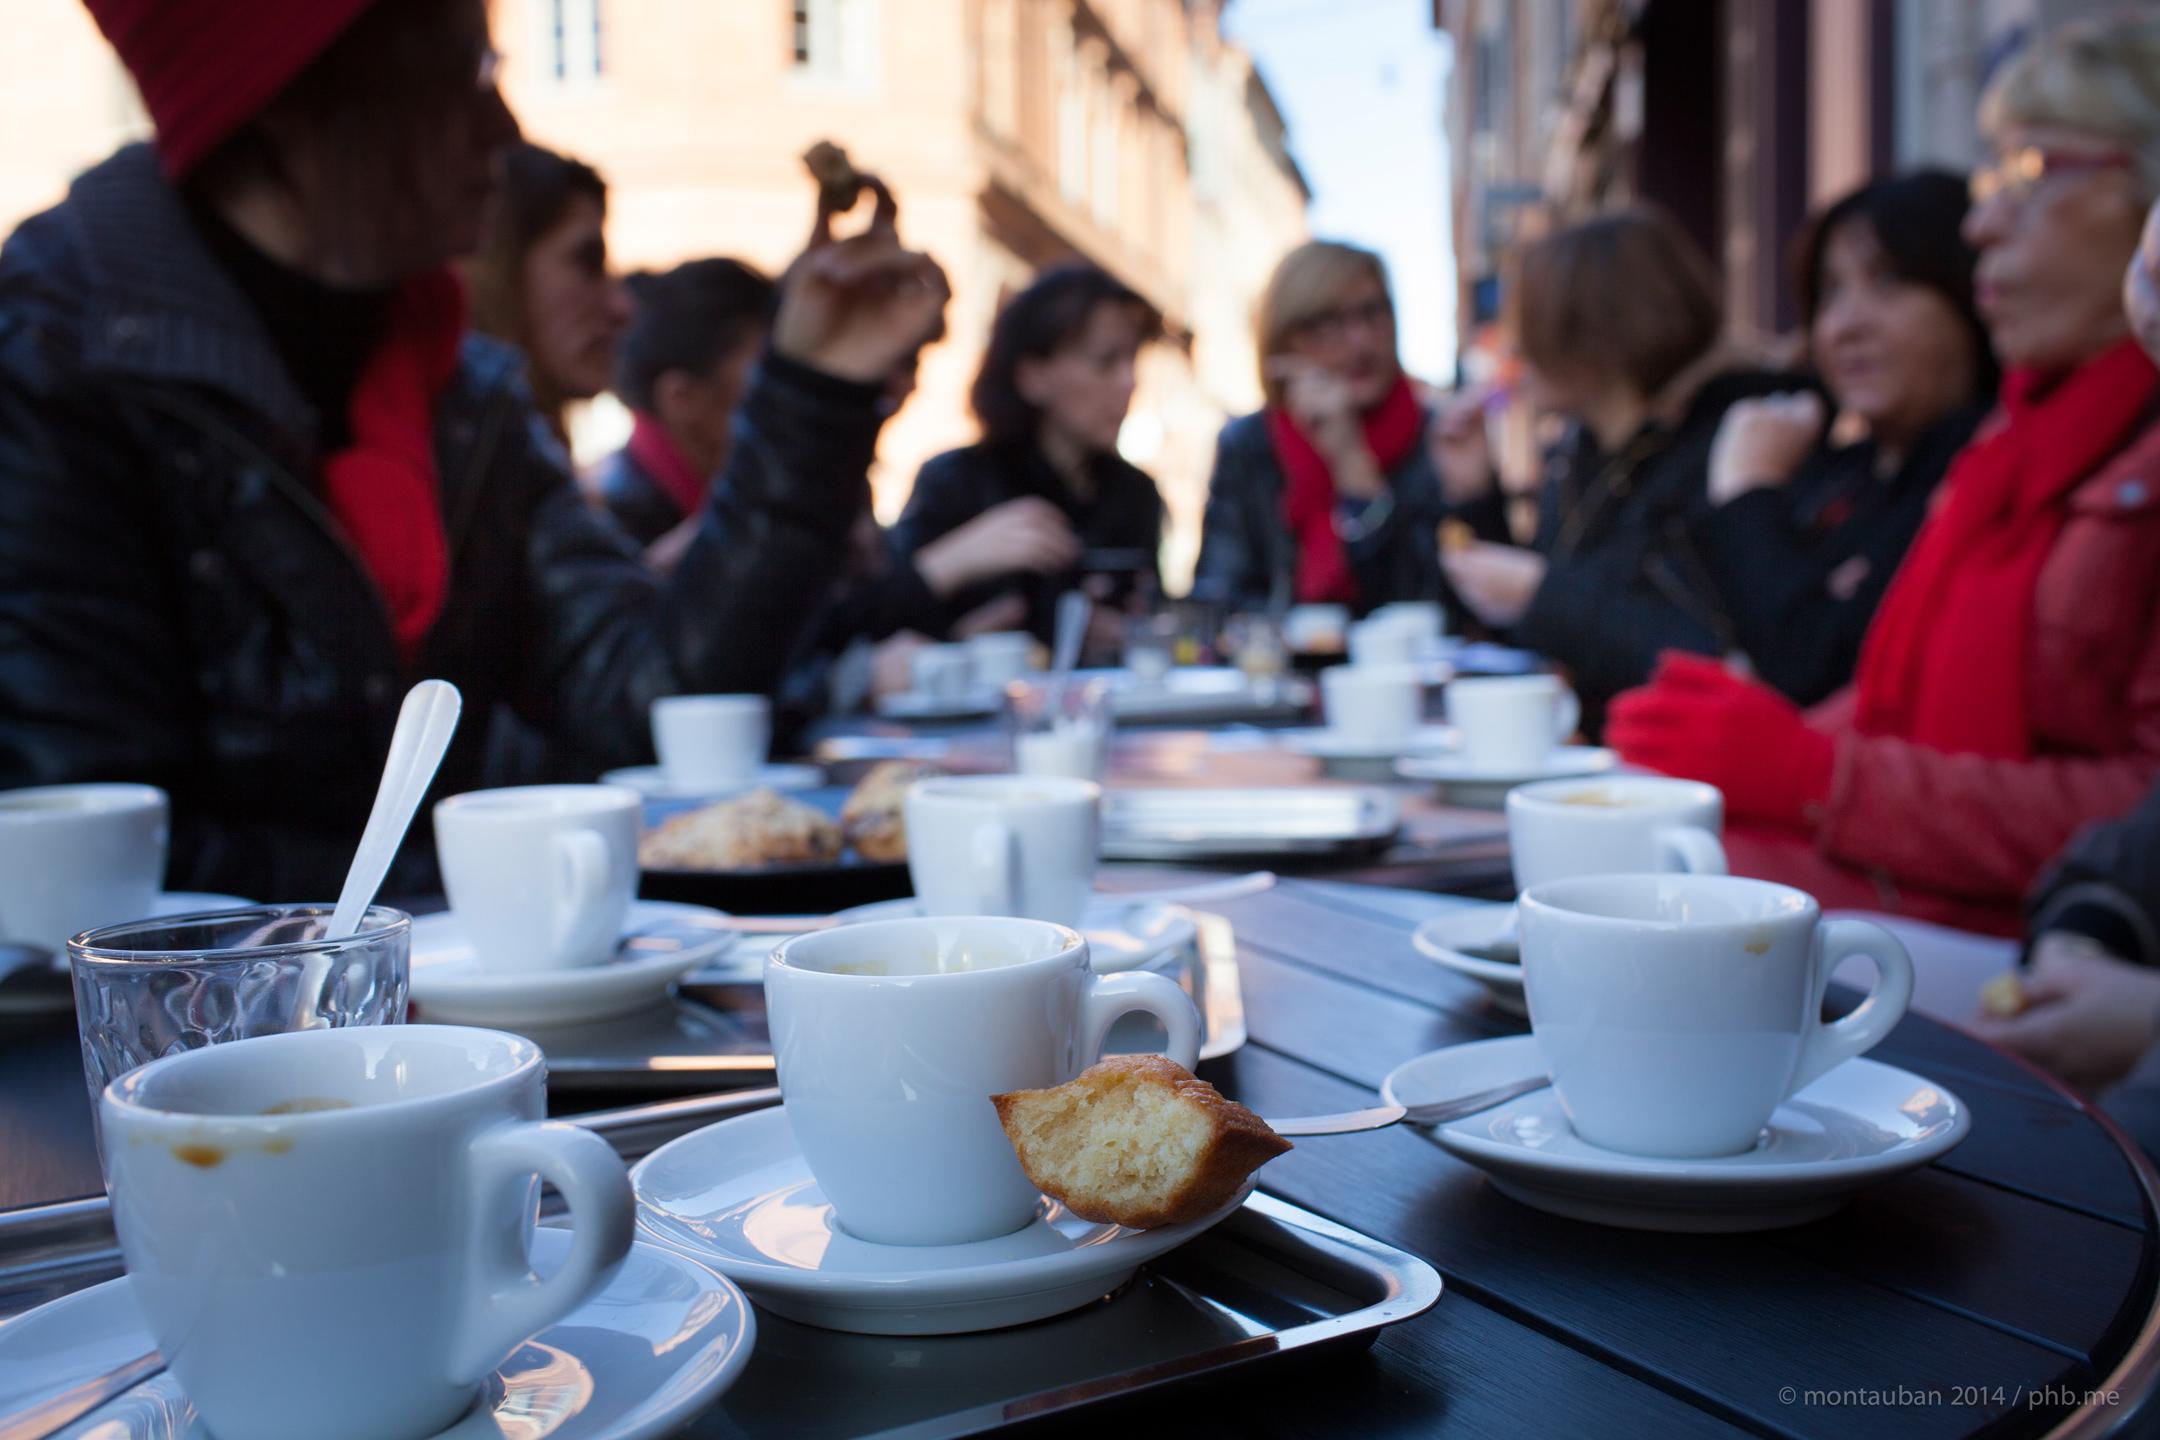 femmes-Montauban-2014_Roland-Garrigues-egalite-IMG_0779